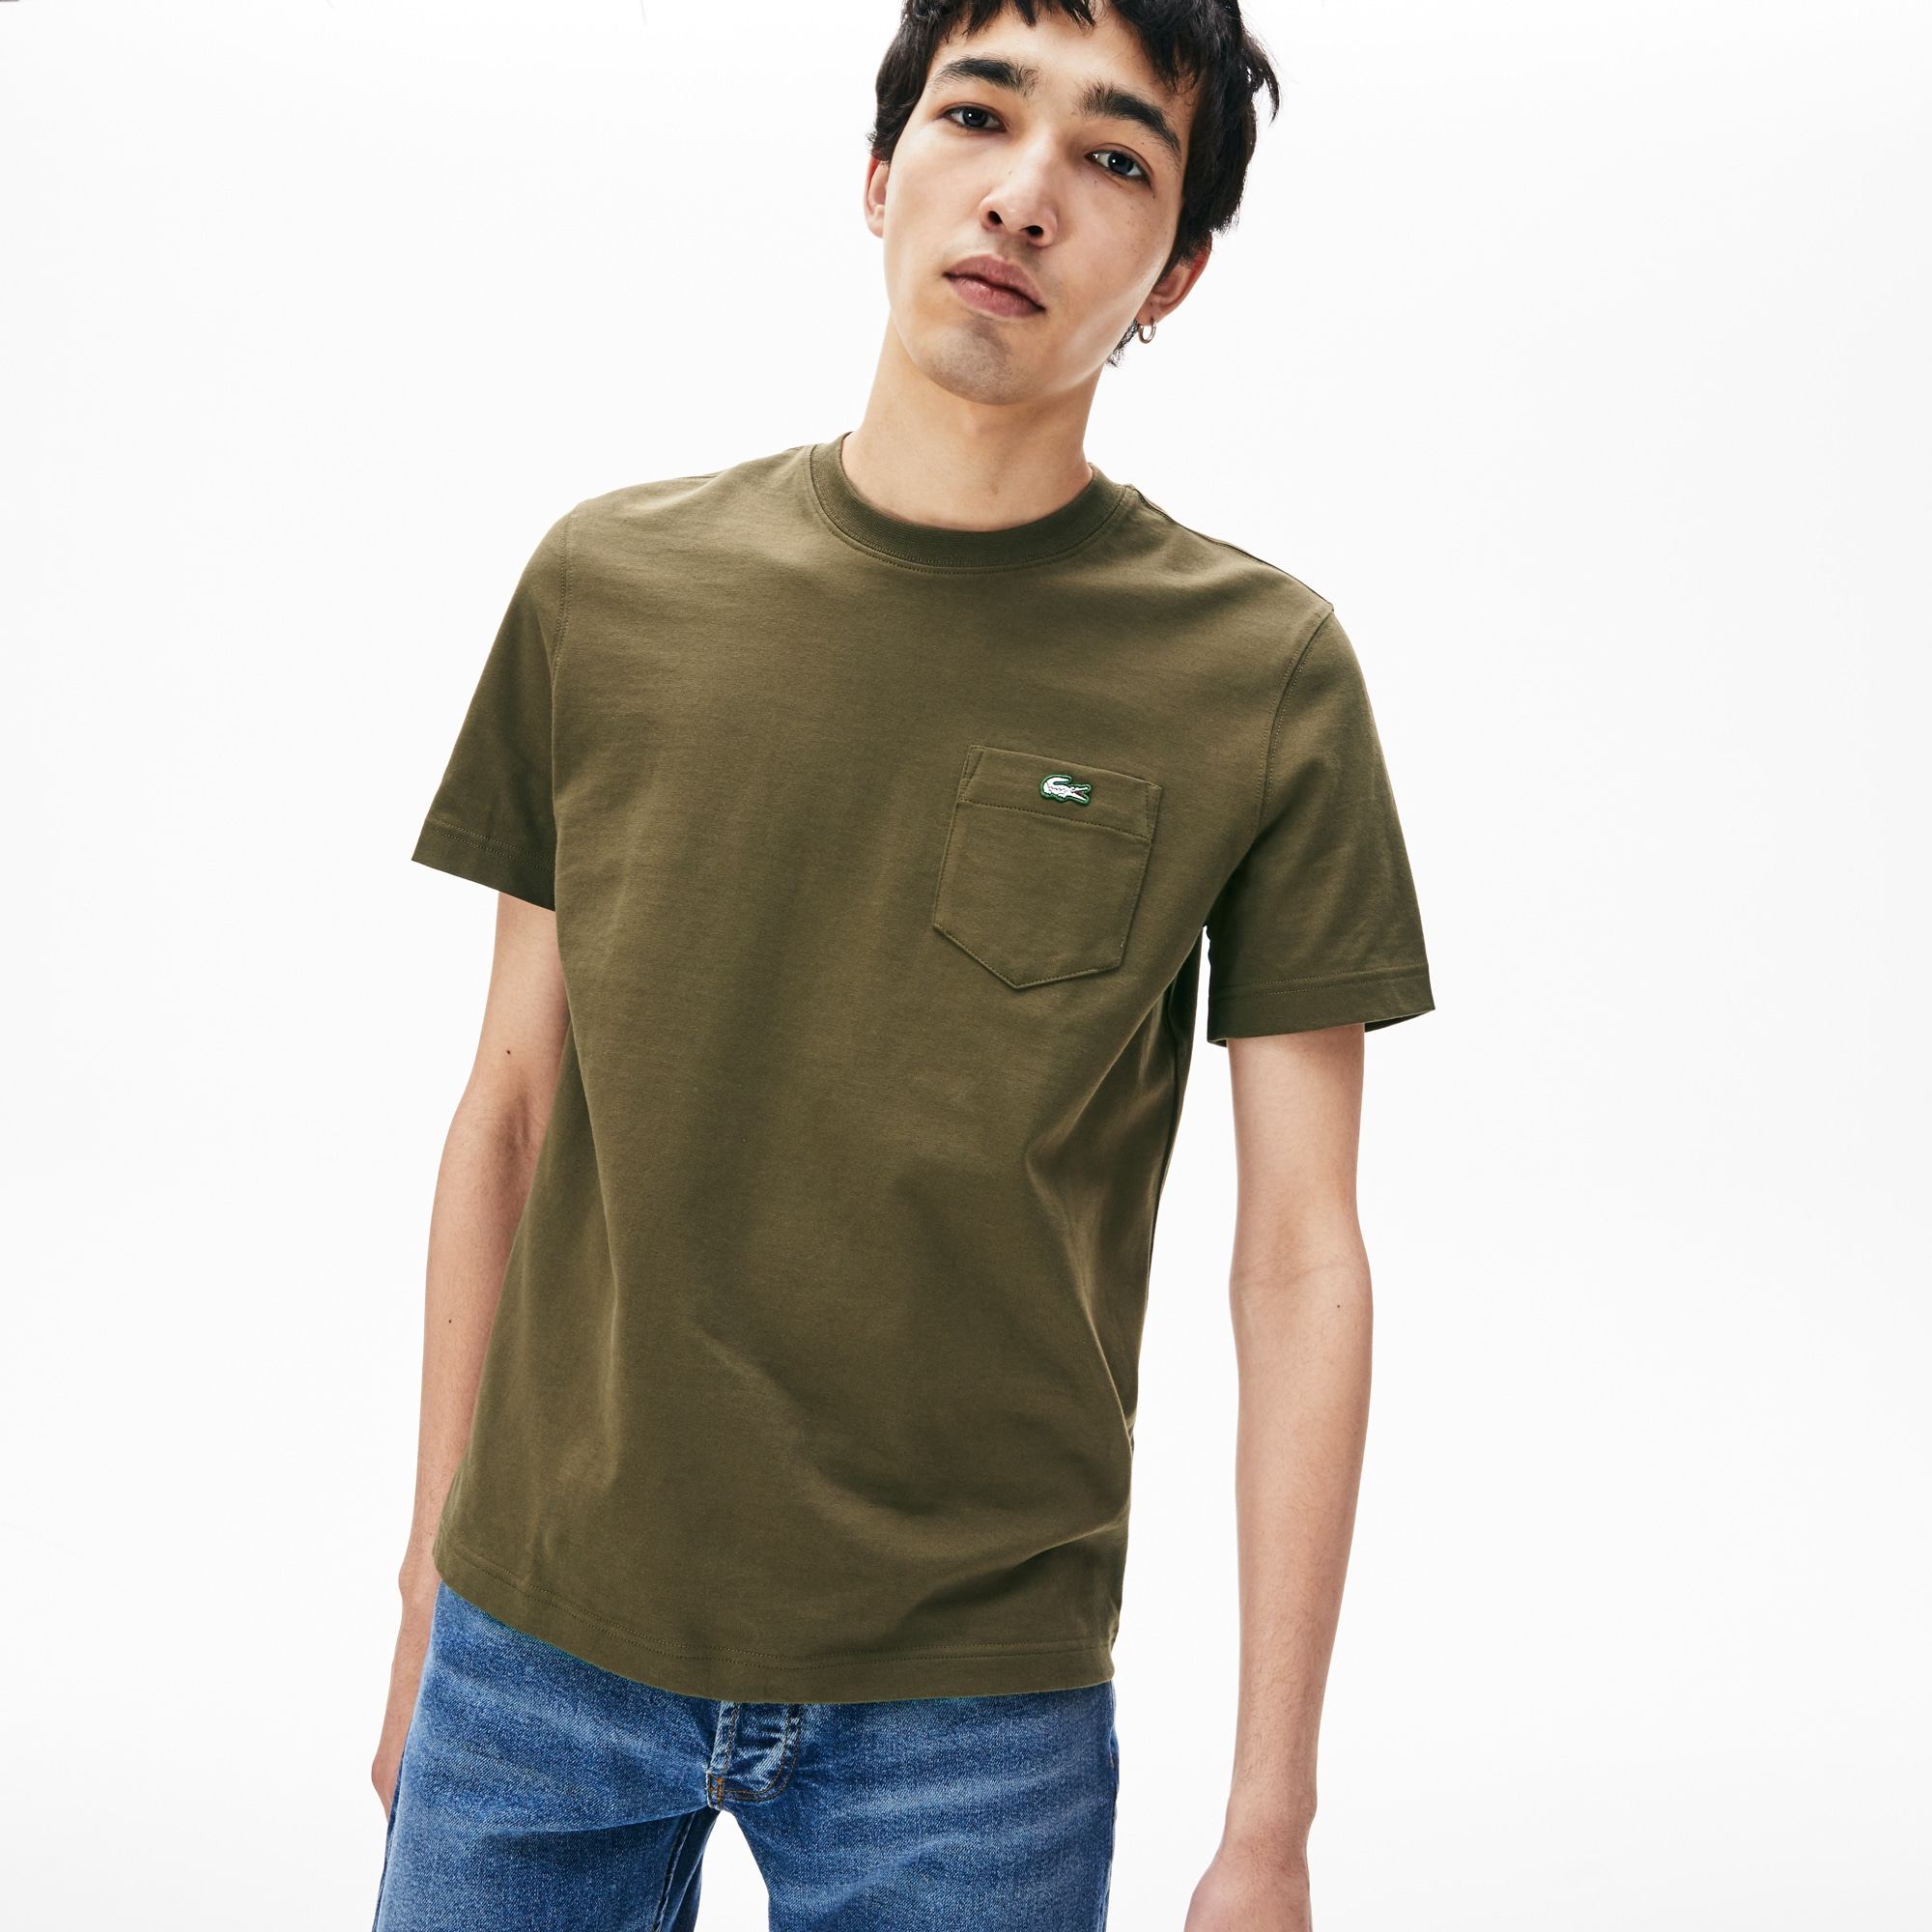 00e15009 Lacoste Unisex Live Cotton Jersey T-Shirt In Khaki Green | ModeSens